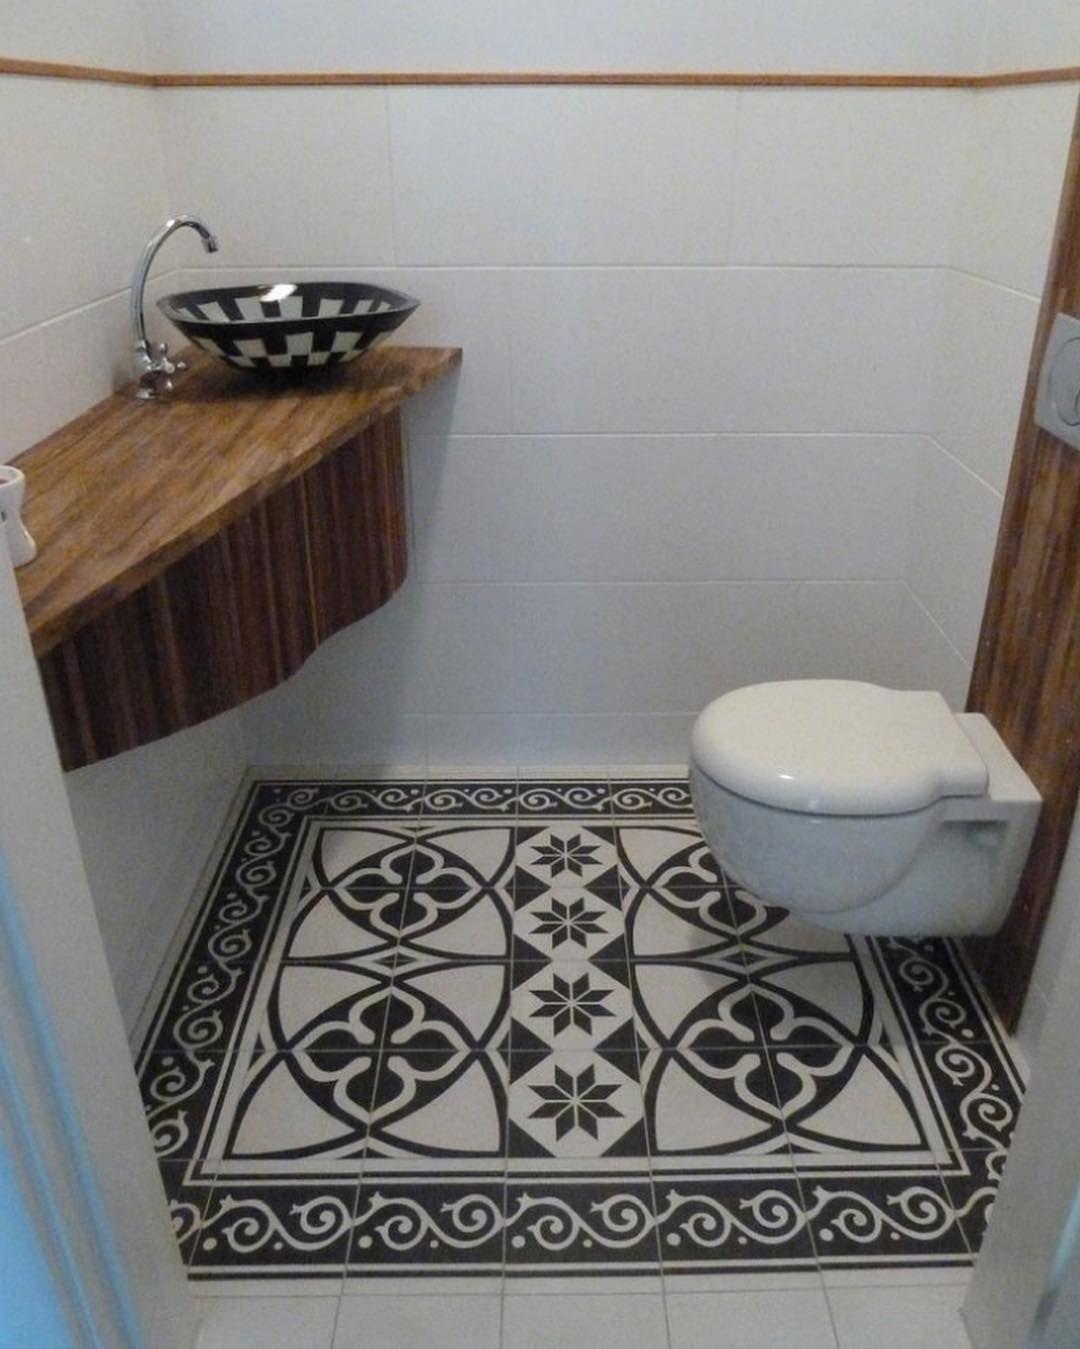 Small Bathroom Ideas Downstairsloo Toilet Bathroomdesign Tightspaces Interiors Irishinteriors Downstairstoil Small Toilet Room Toilet Small Bathroom